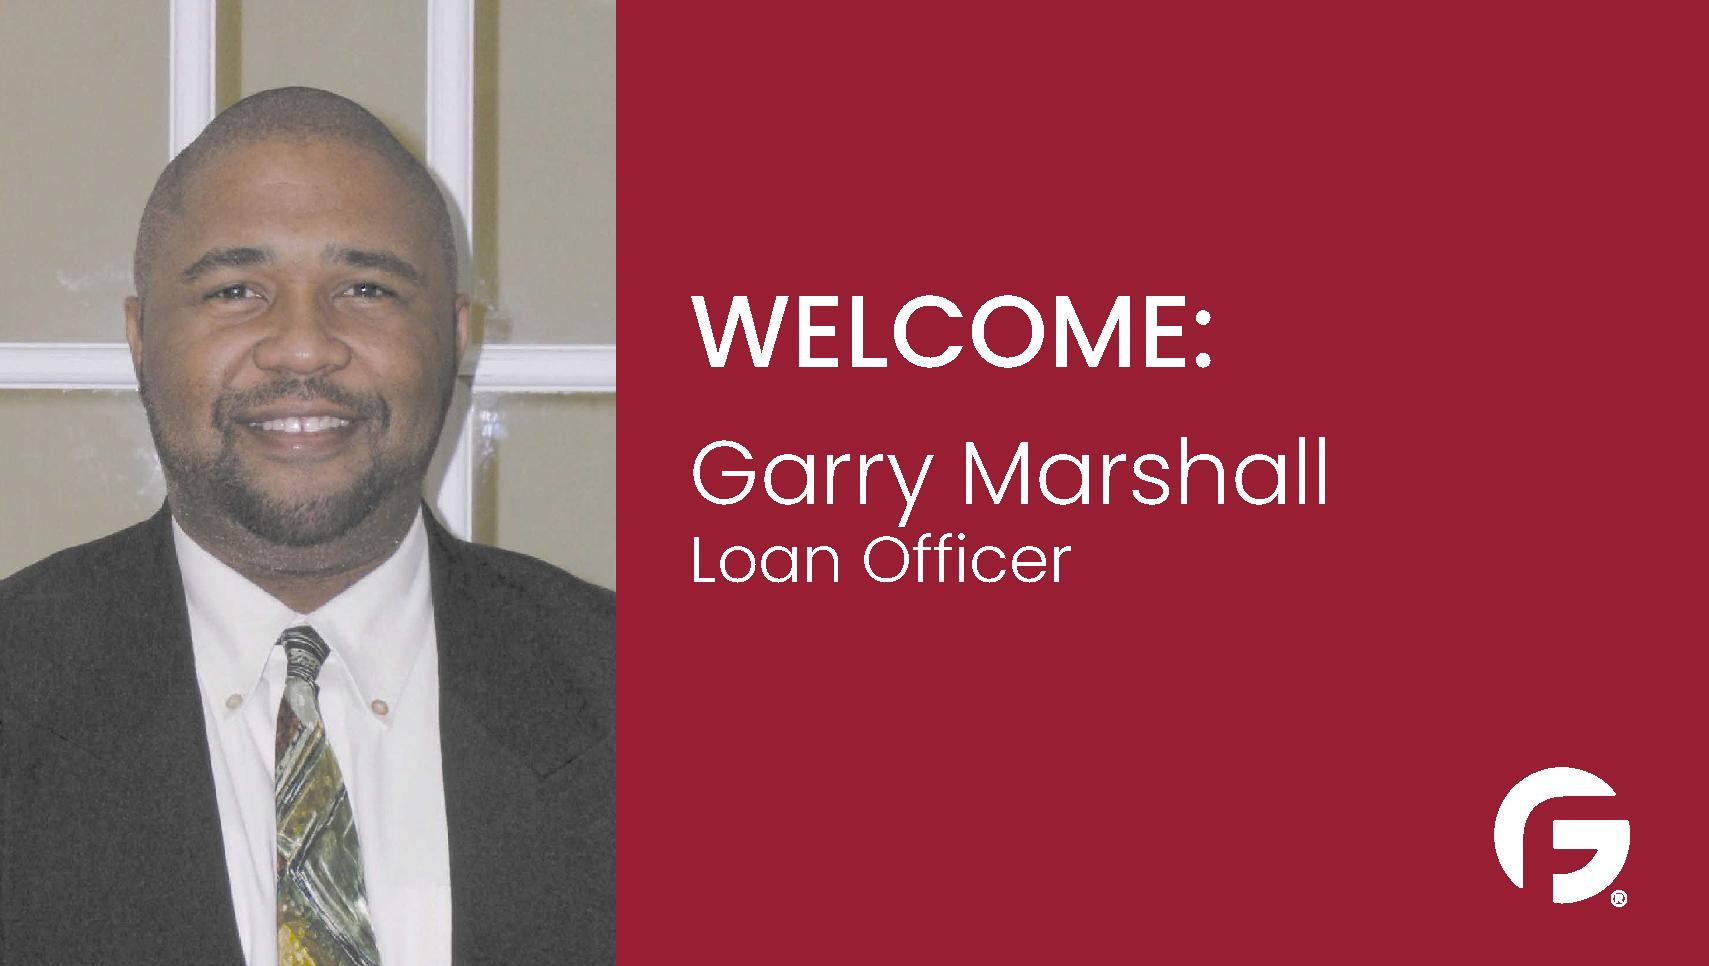 Garry Marshall, Loan Officer, serving Mississippi